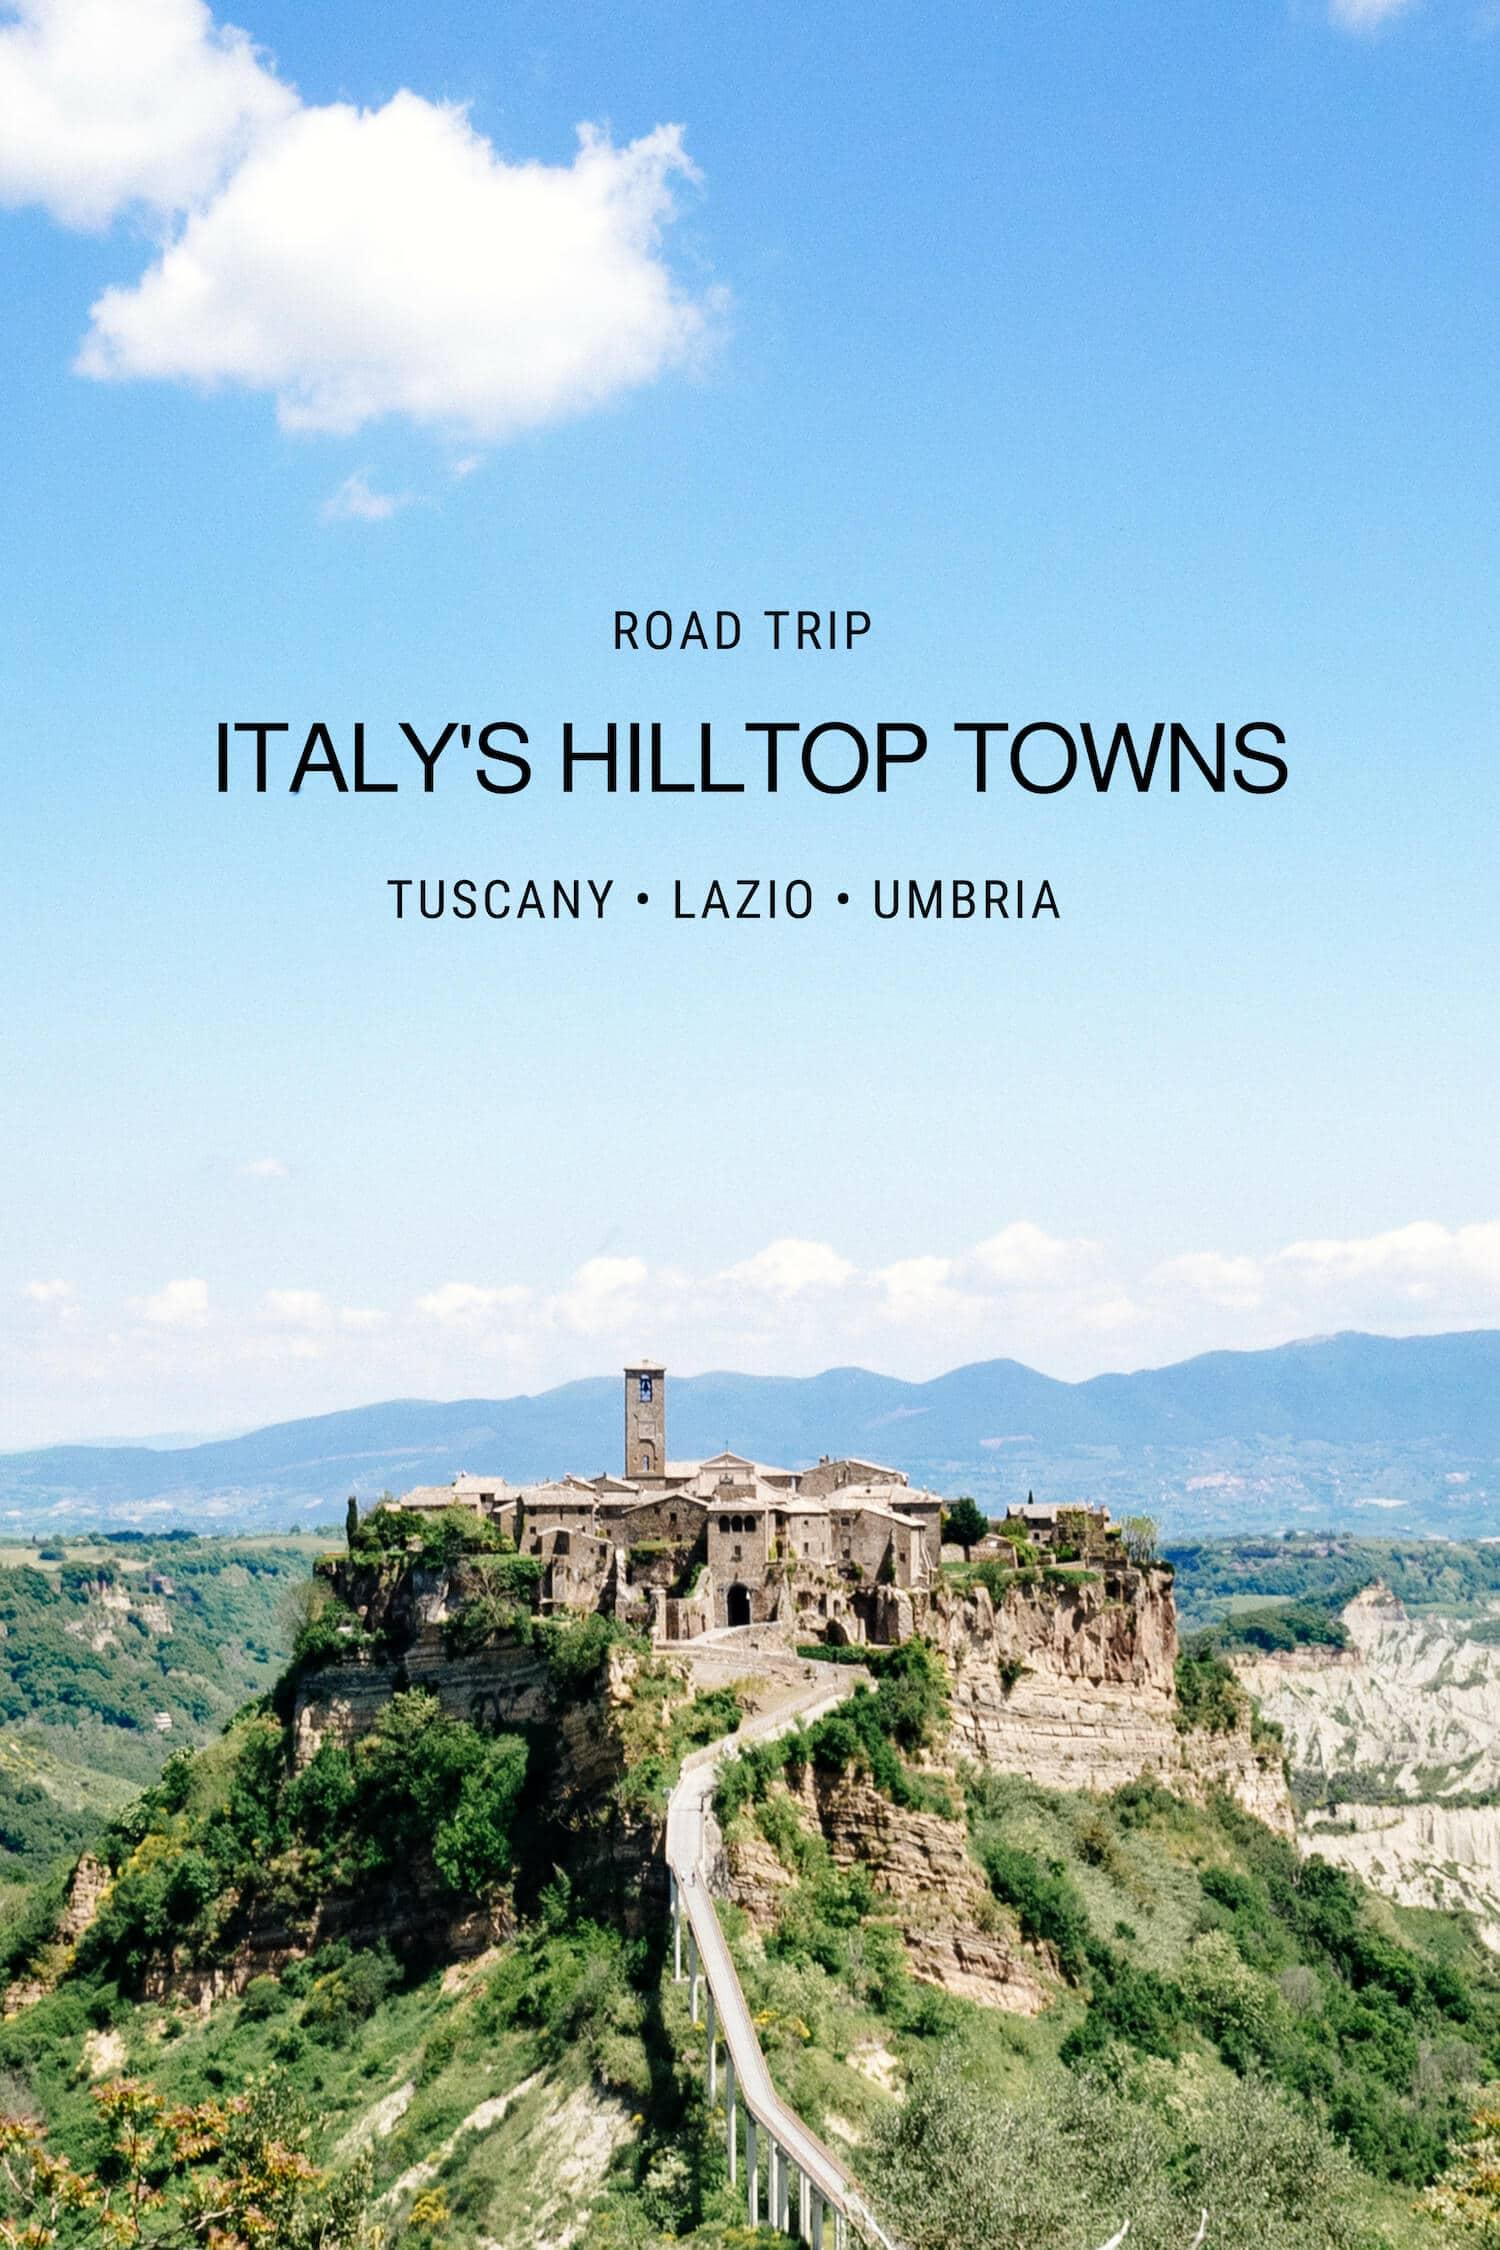 Italy's Hilltop Towns - Tuscany Lazio Umbria